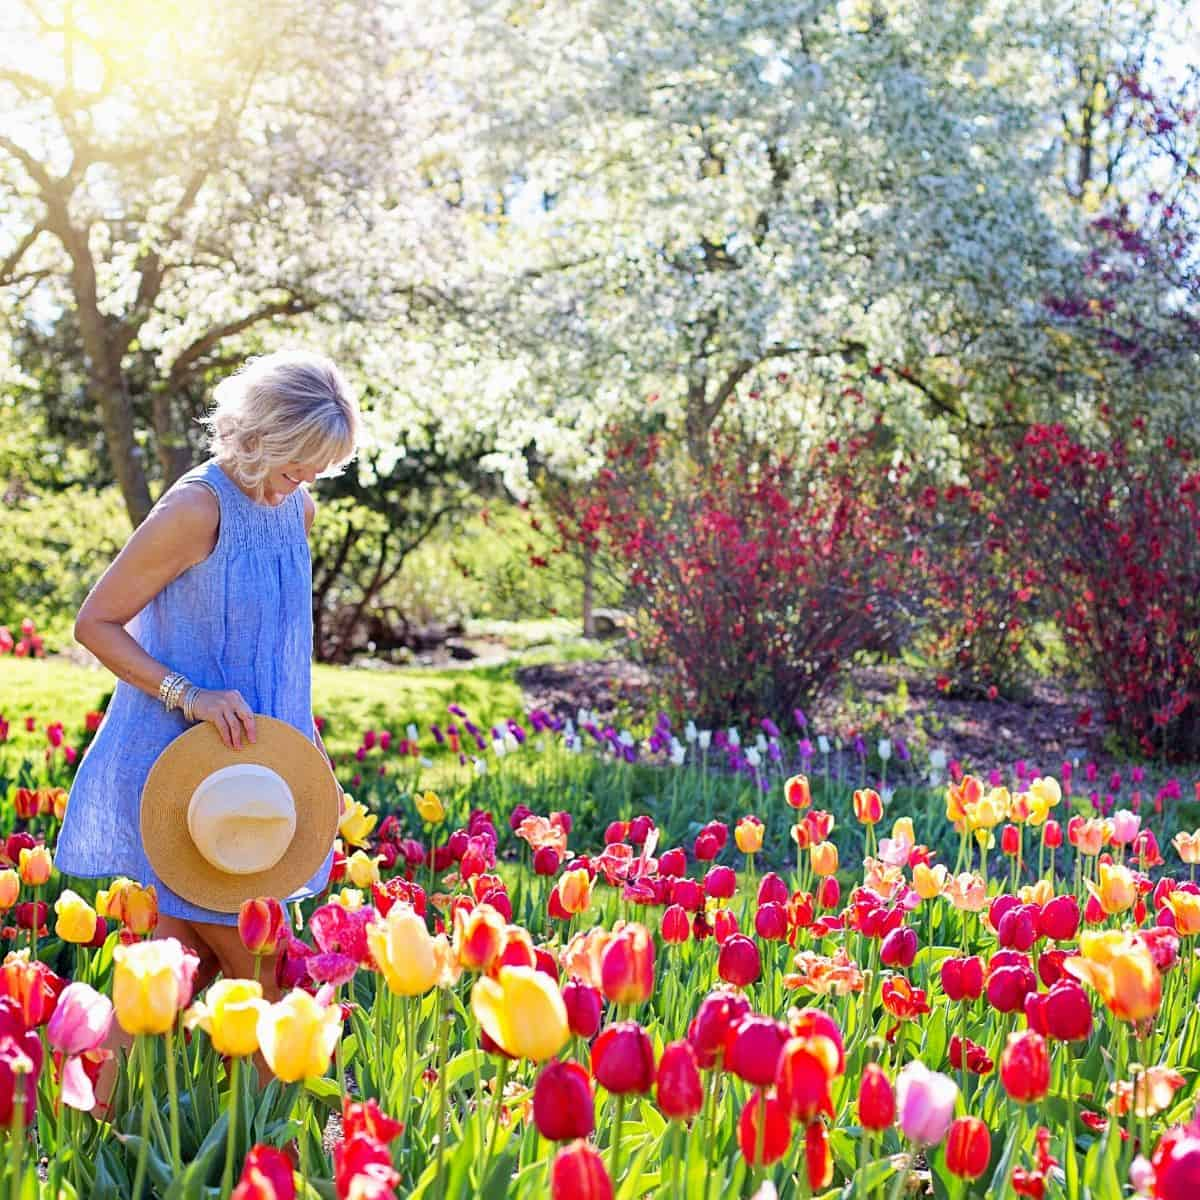 10 Spot Terbaik Melihat Festival Taman Bunga Tulip Eropa Asia Amerika